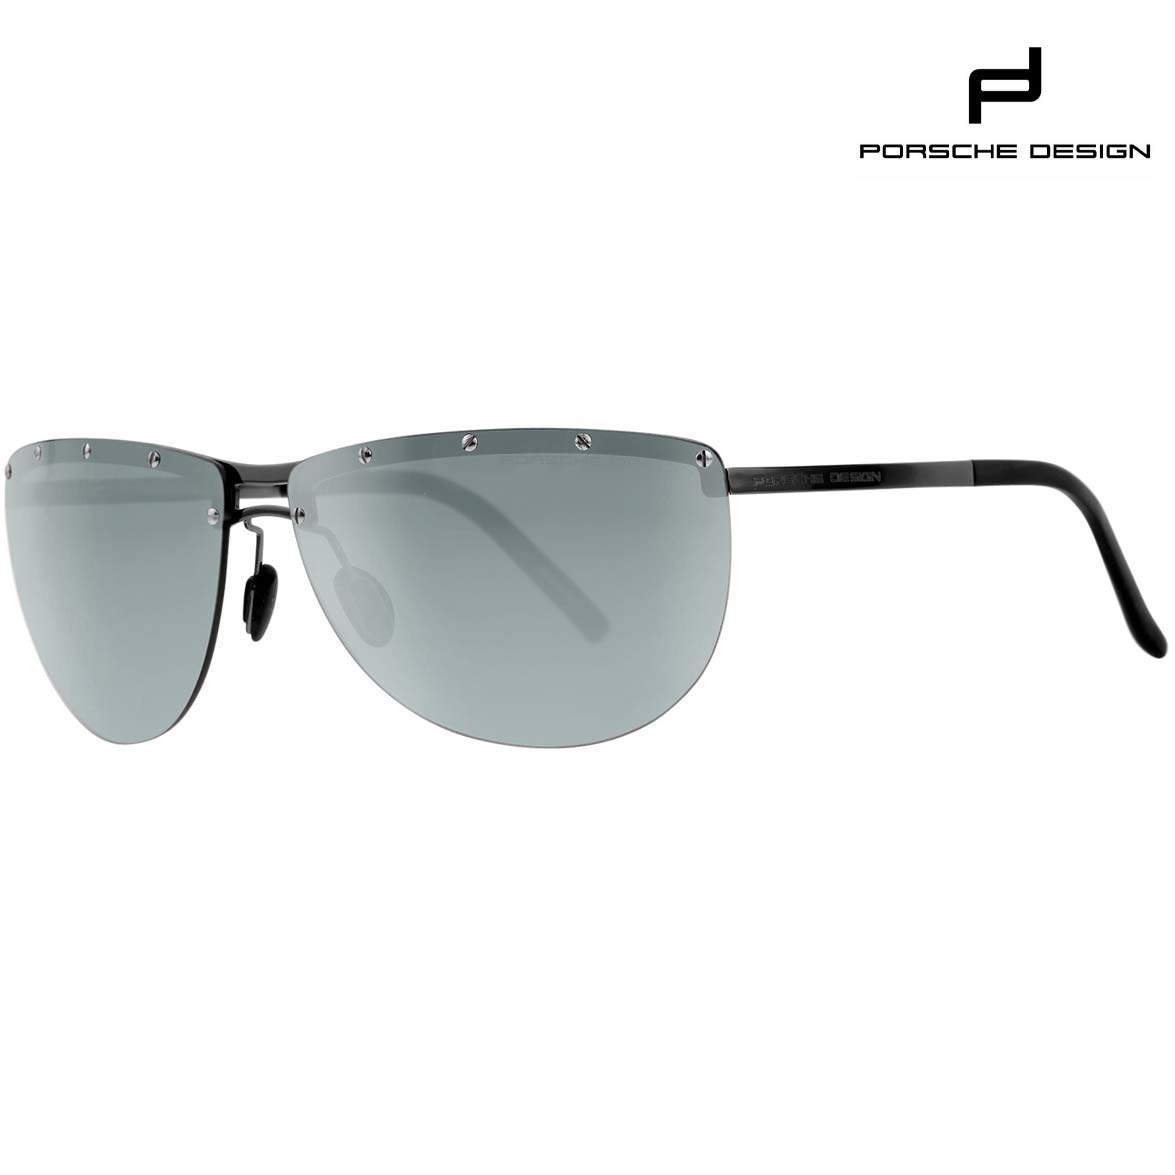 Porsche Design Sunglasses Black Unisex P8577 B